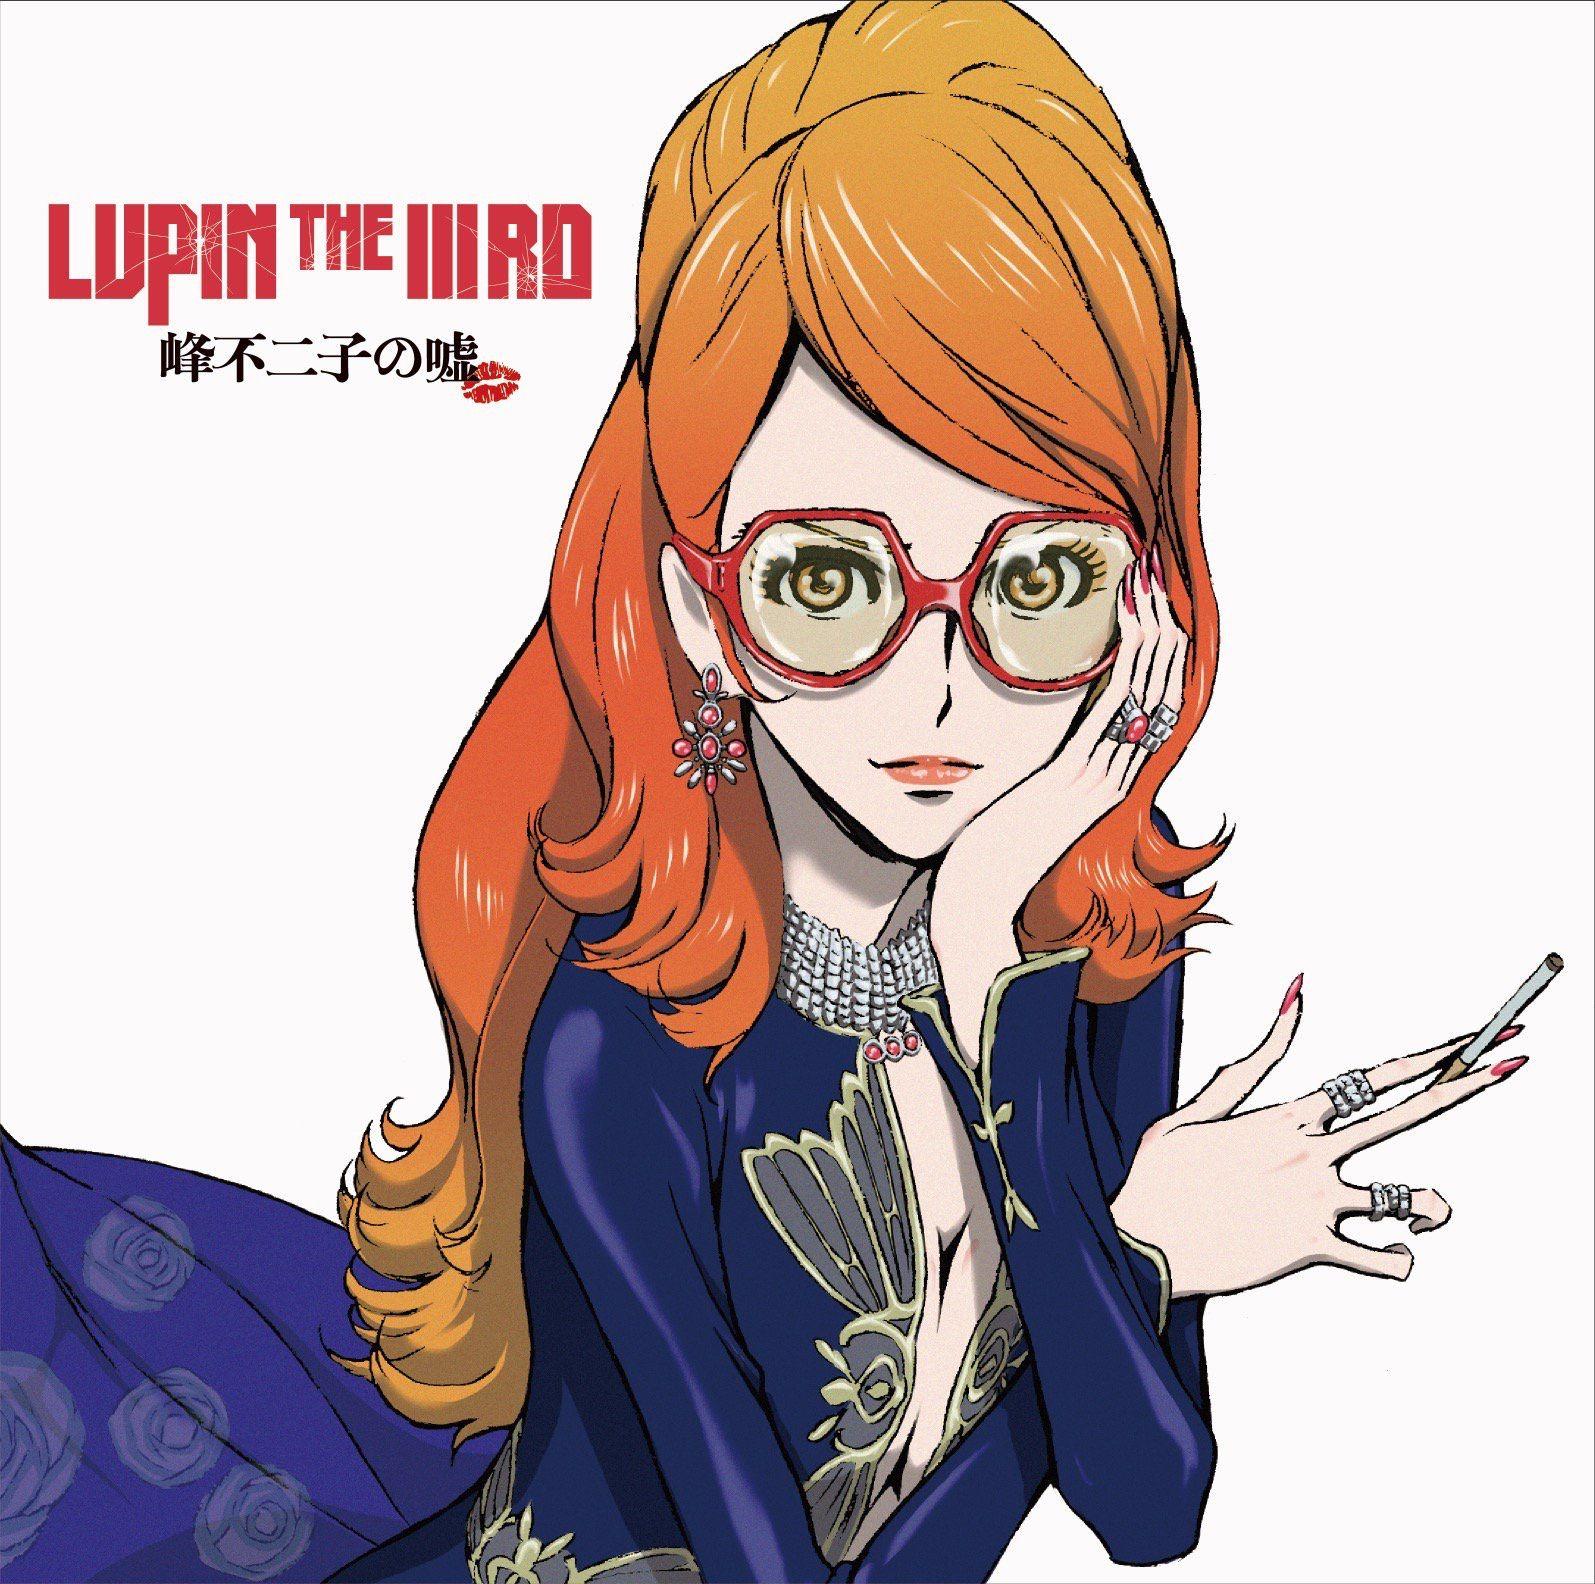 Pin by Sarah on Lupin the 3rd Lupin iii, Anime people